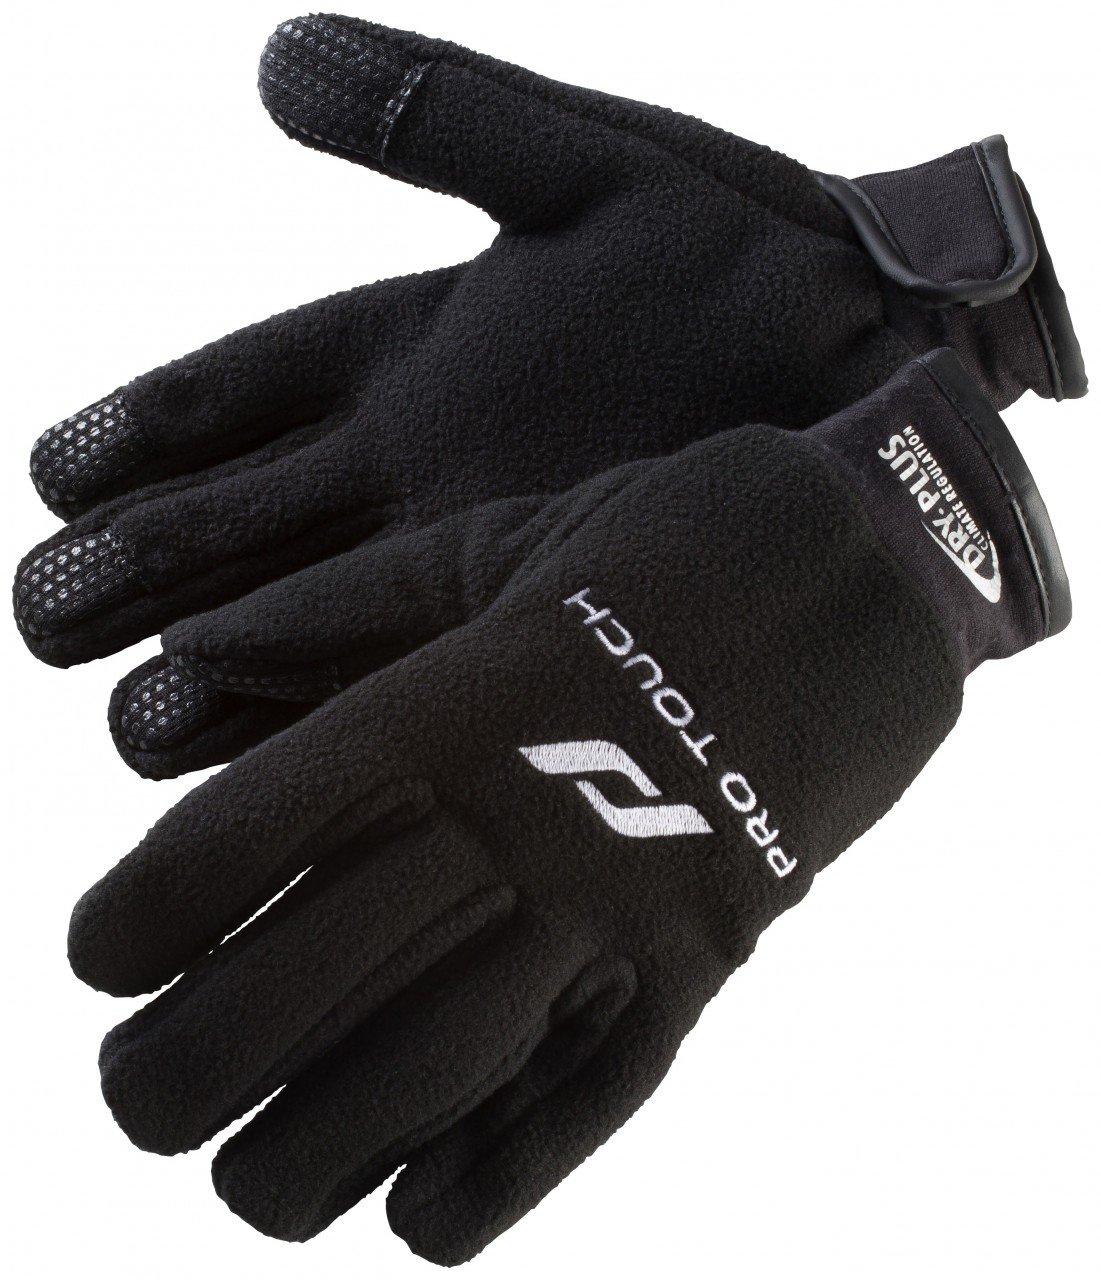 Pro Touch Handschuhe leichte Fußballhandschuhe black Laufhandschuhe